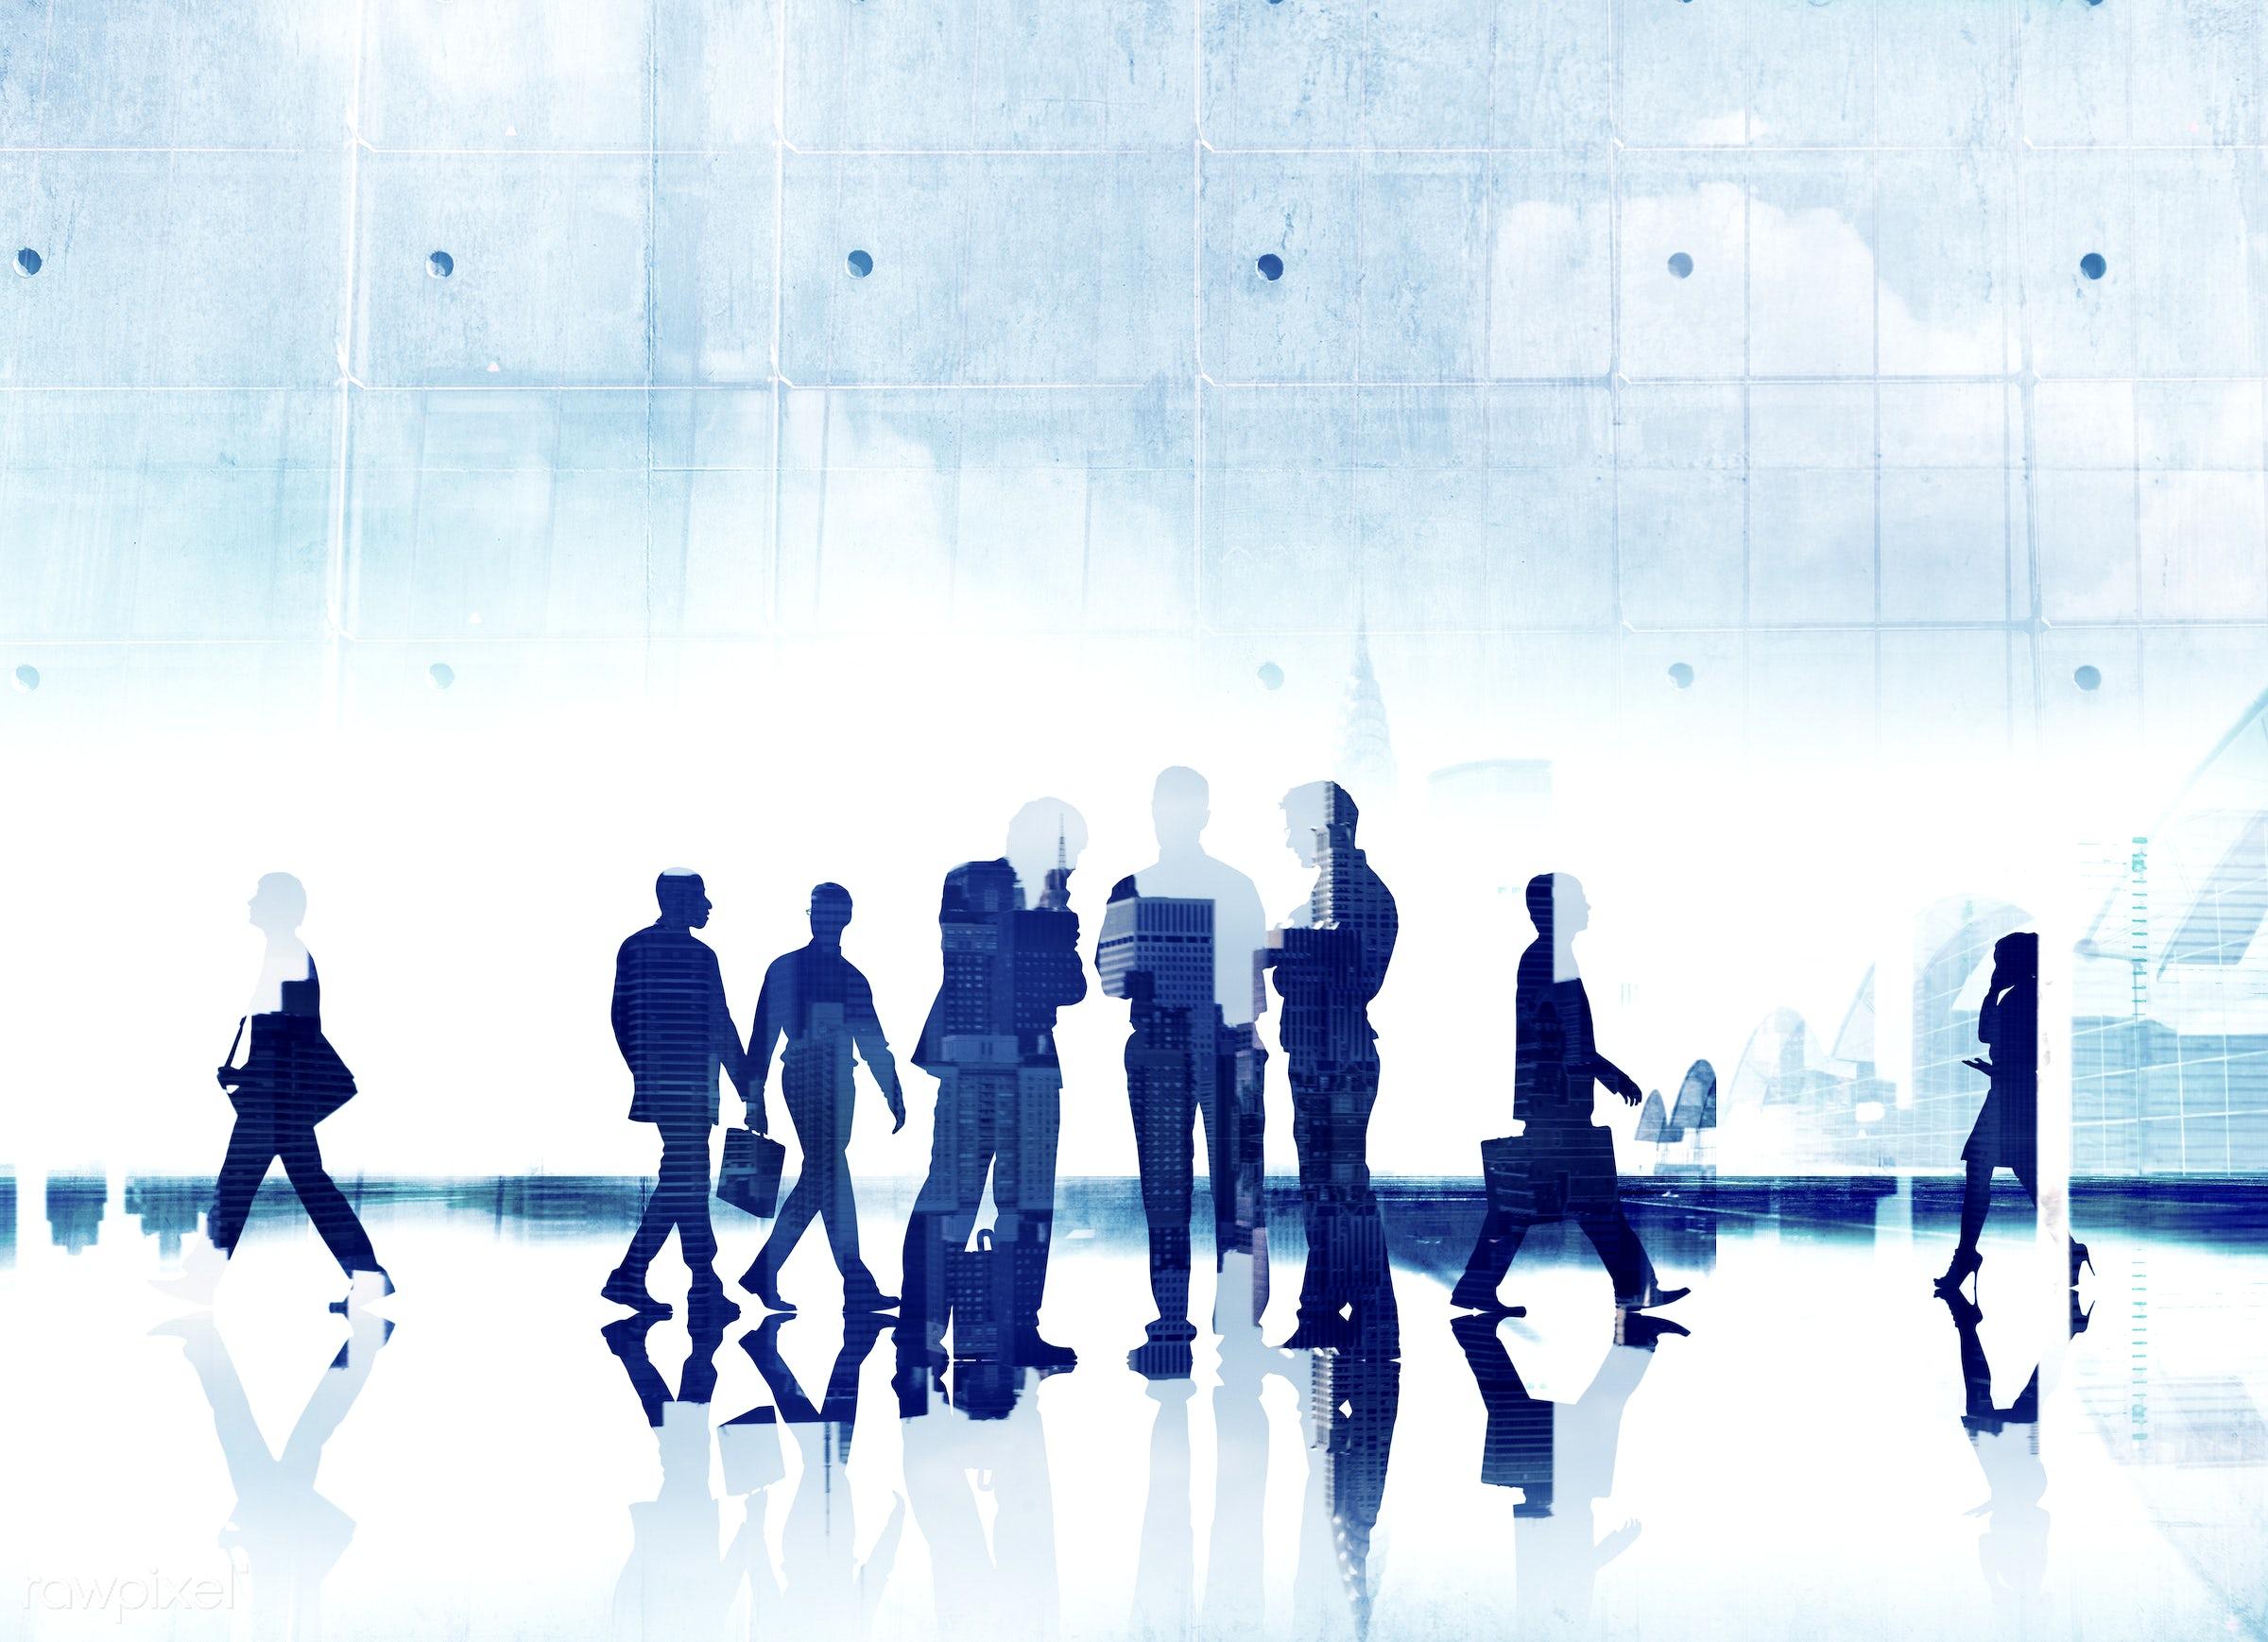 brainstorming, building, business, business people, businessmen, businesswomen, busy, colleague, communication, commuter,...